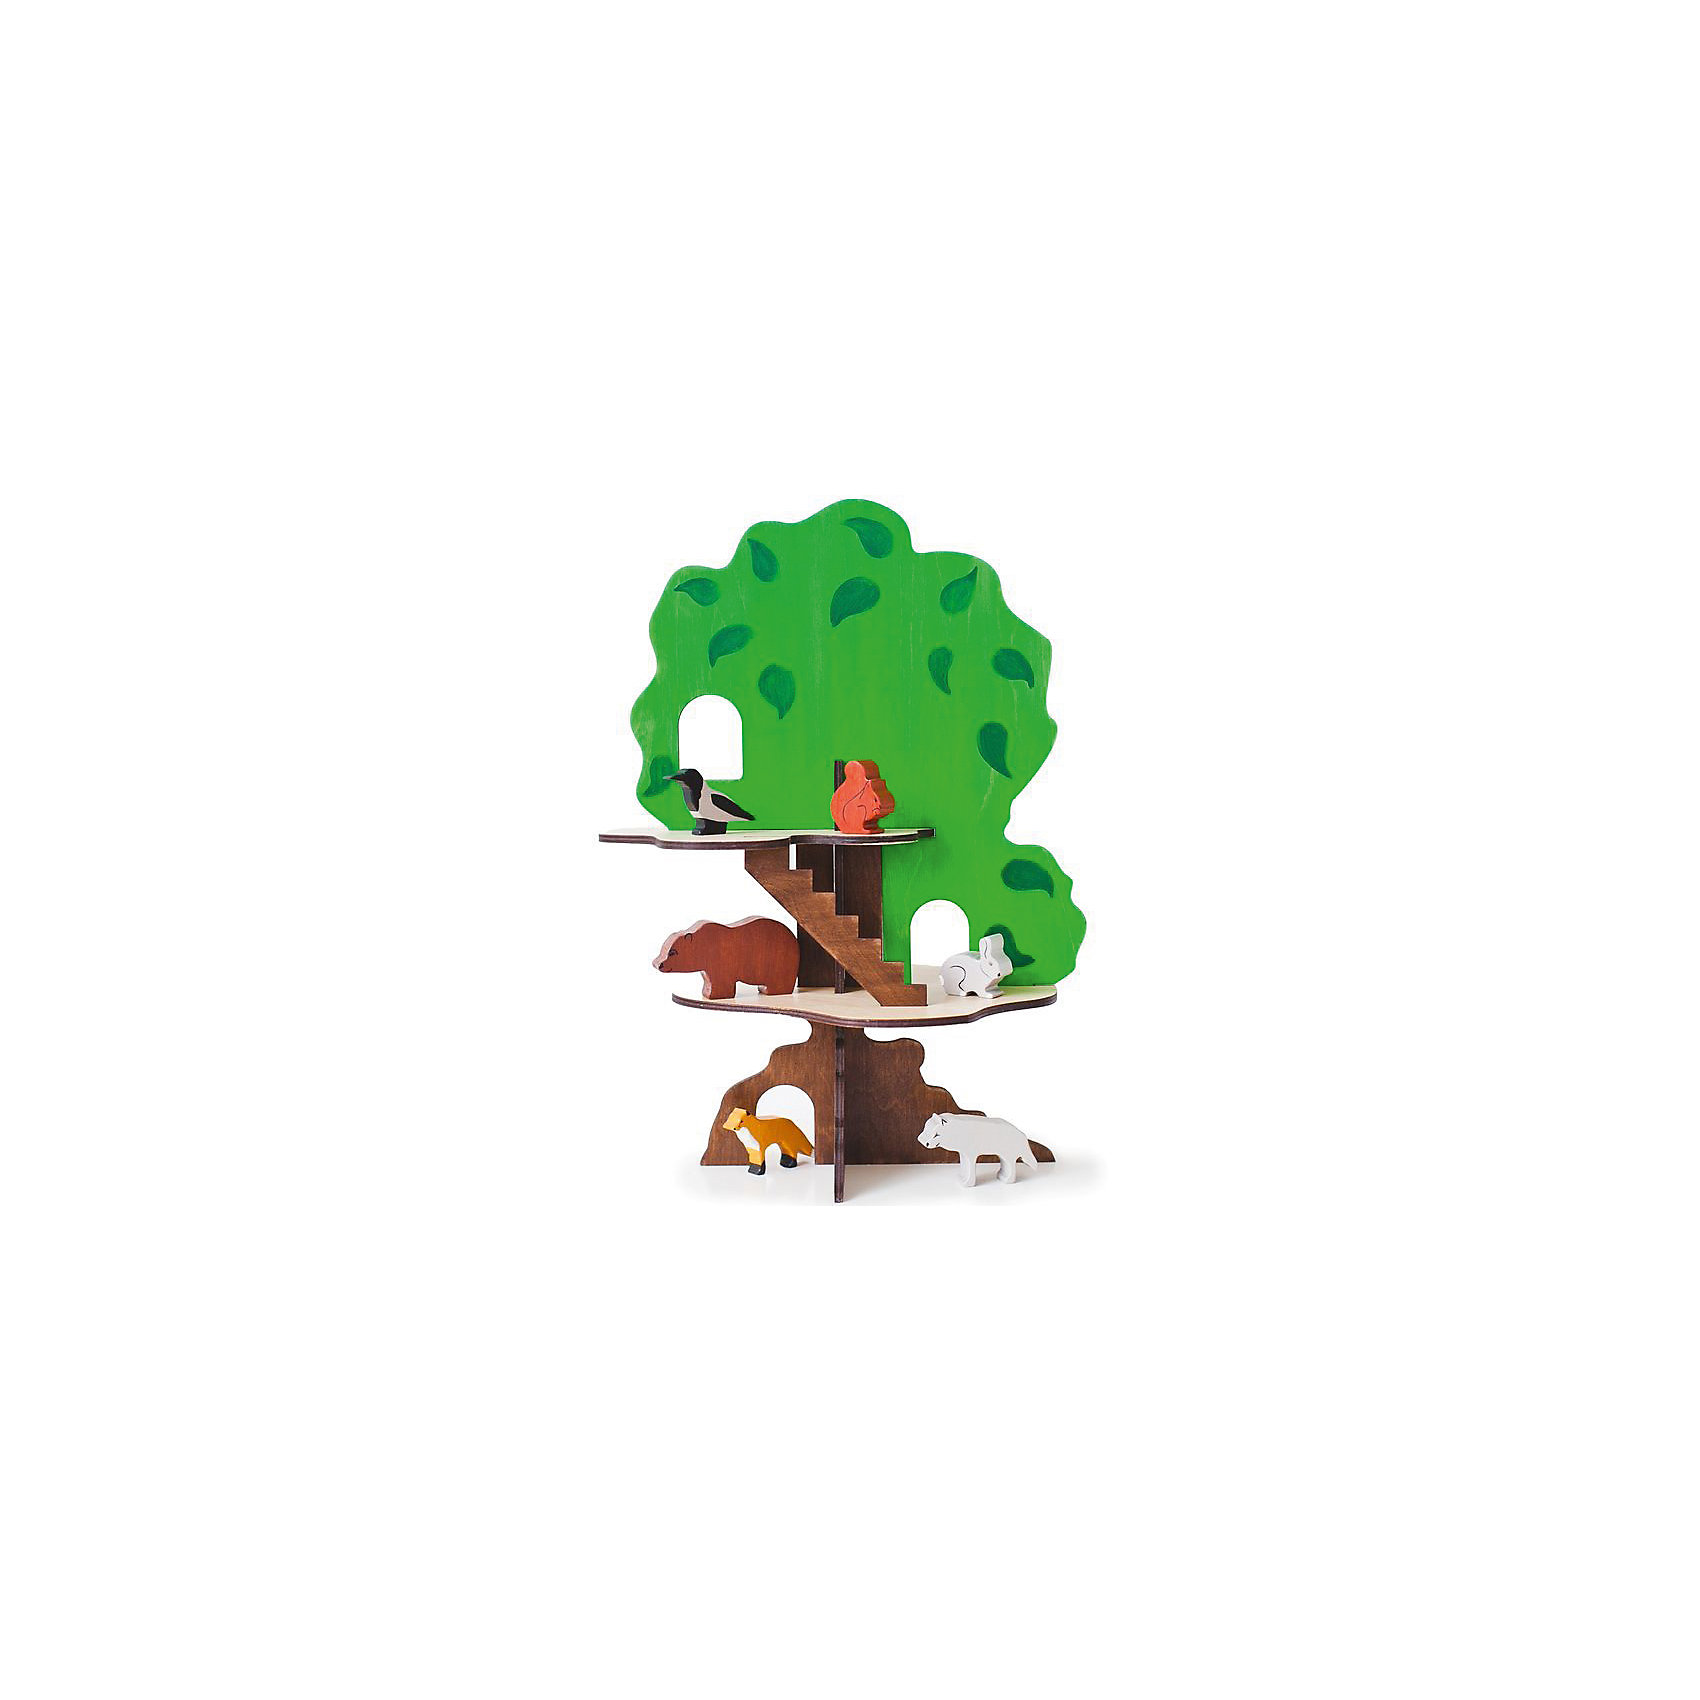 PAREMO Игрушка-конструктор Дом-дерево с 6 фигурками животных, PAREMO игрушка для животных каскад удочка с микки маусом 47 см